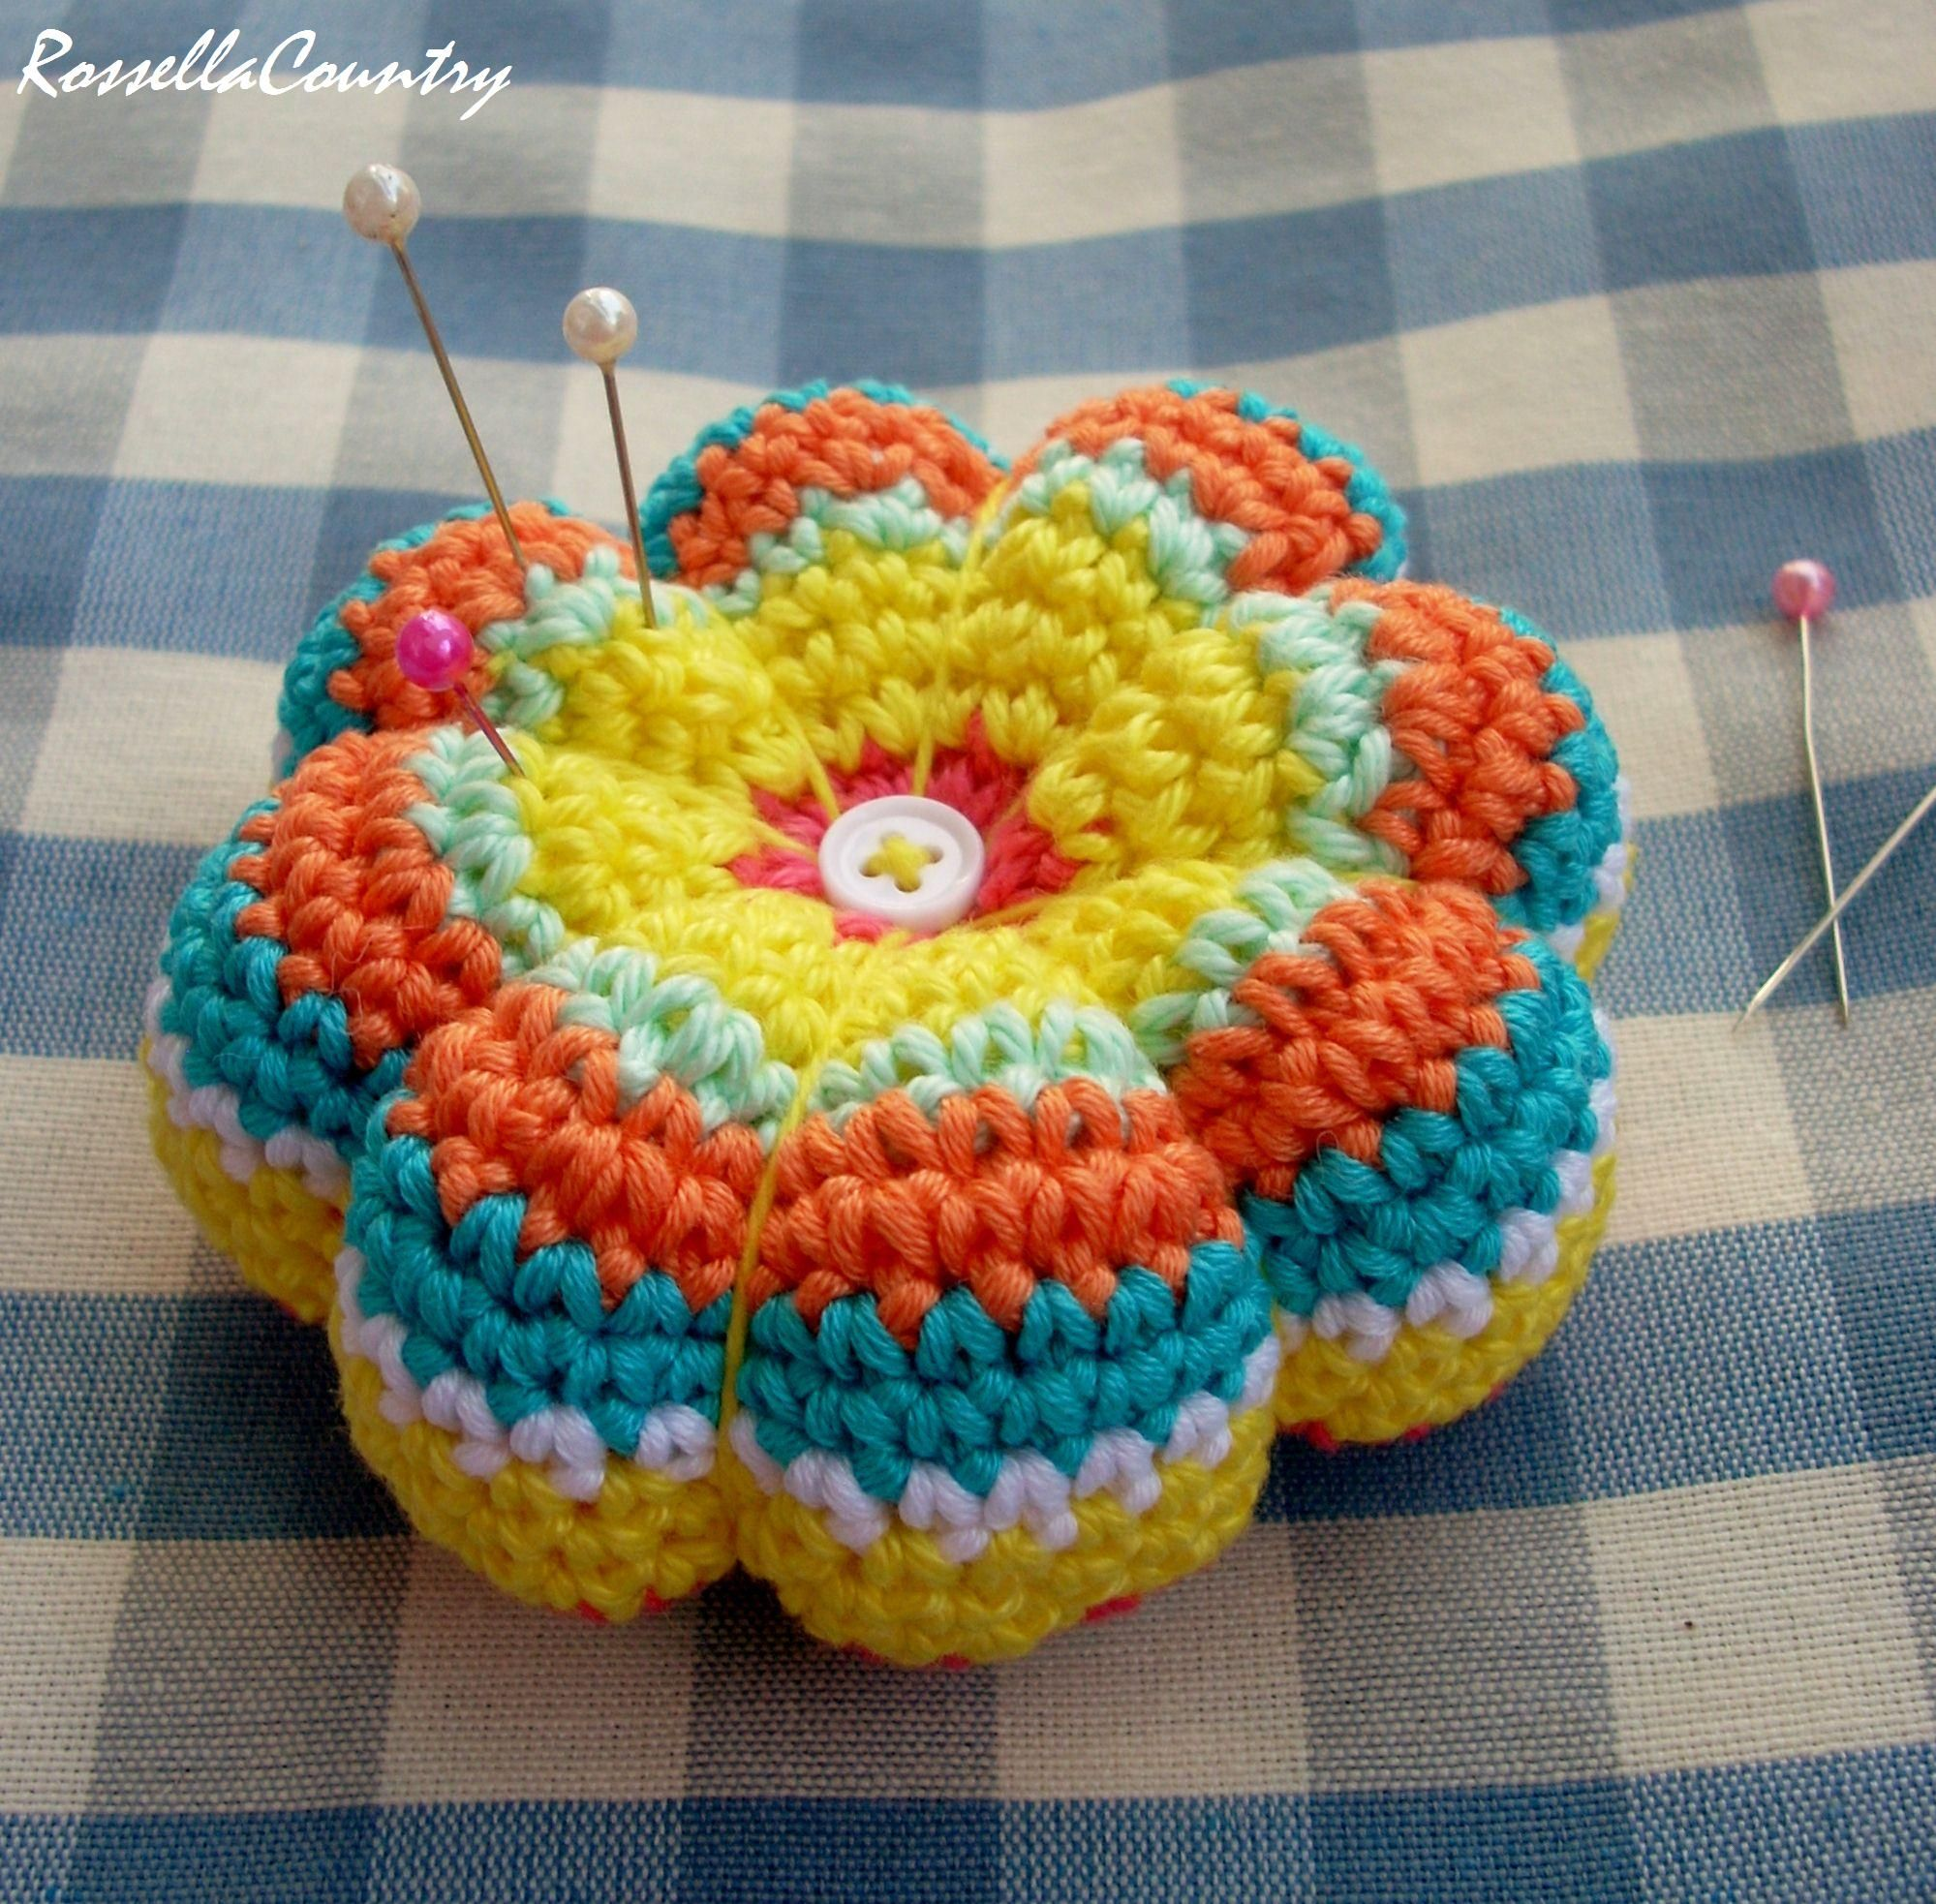 Pincushion crochet - tutorial - | tutorial | Pinterest